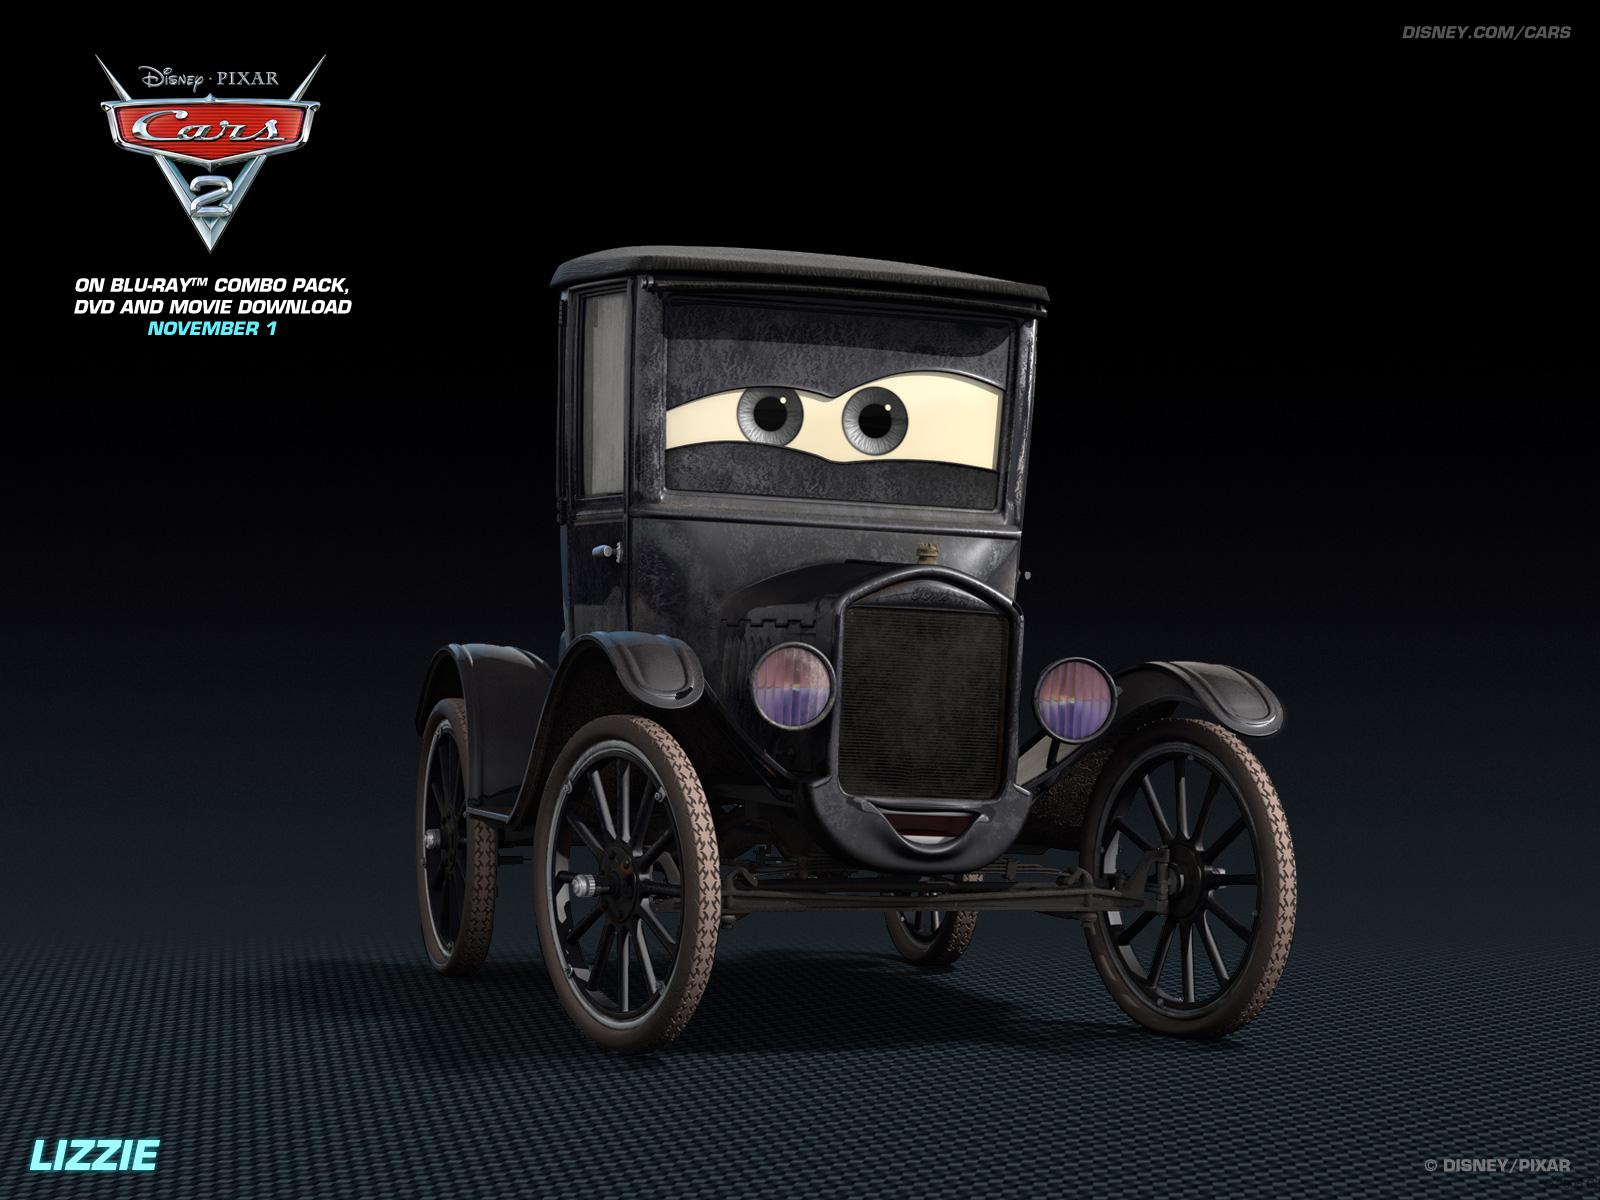 Lizzie   Disney Pixar Cars 2 Wallpaper 28261241 1600x1200